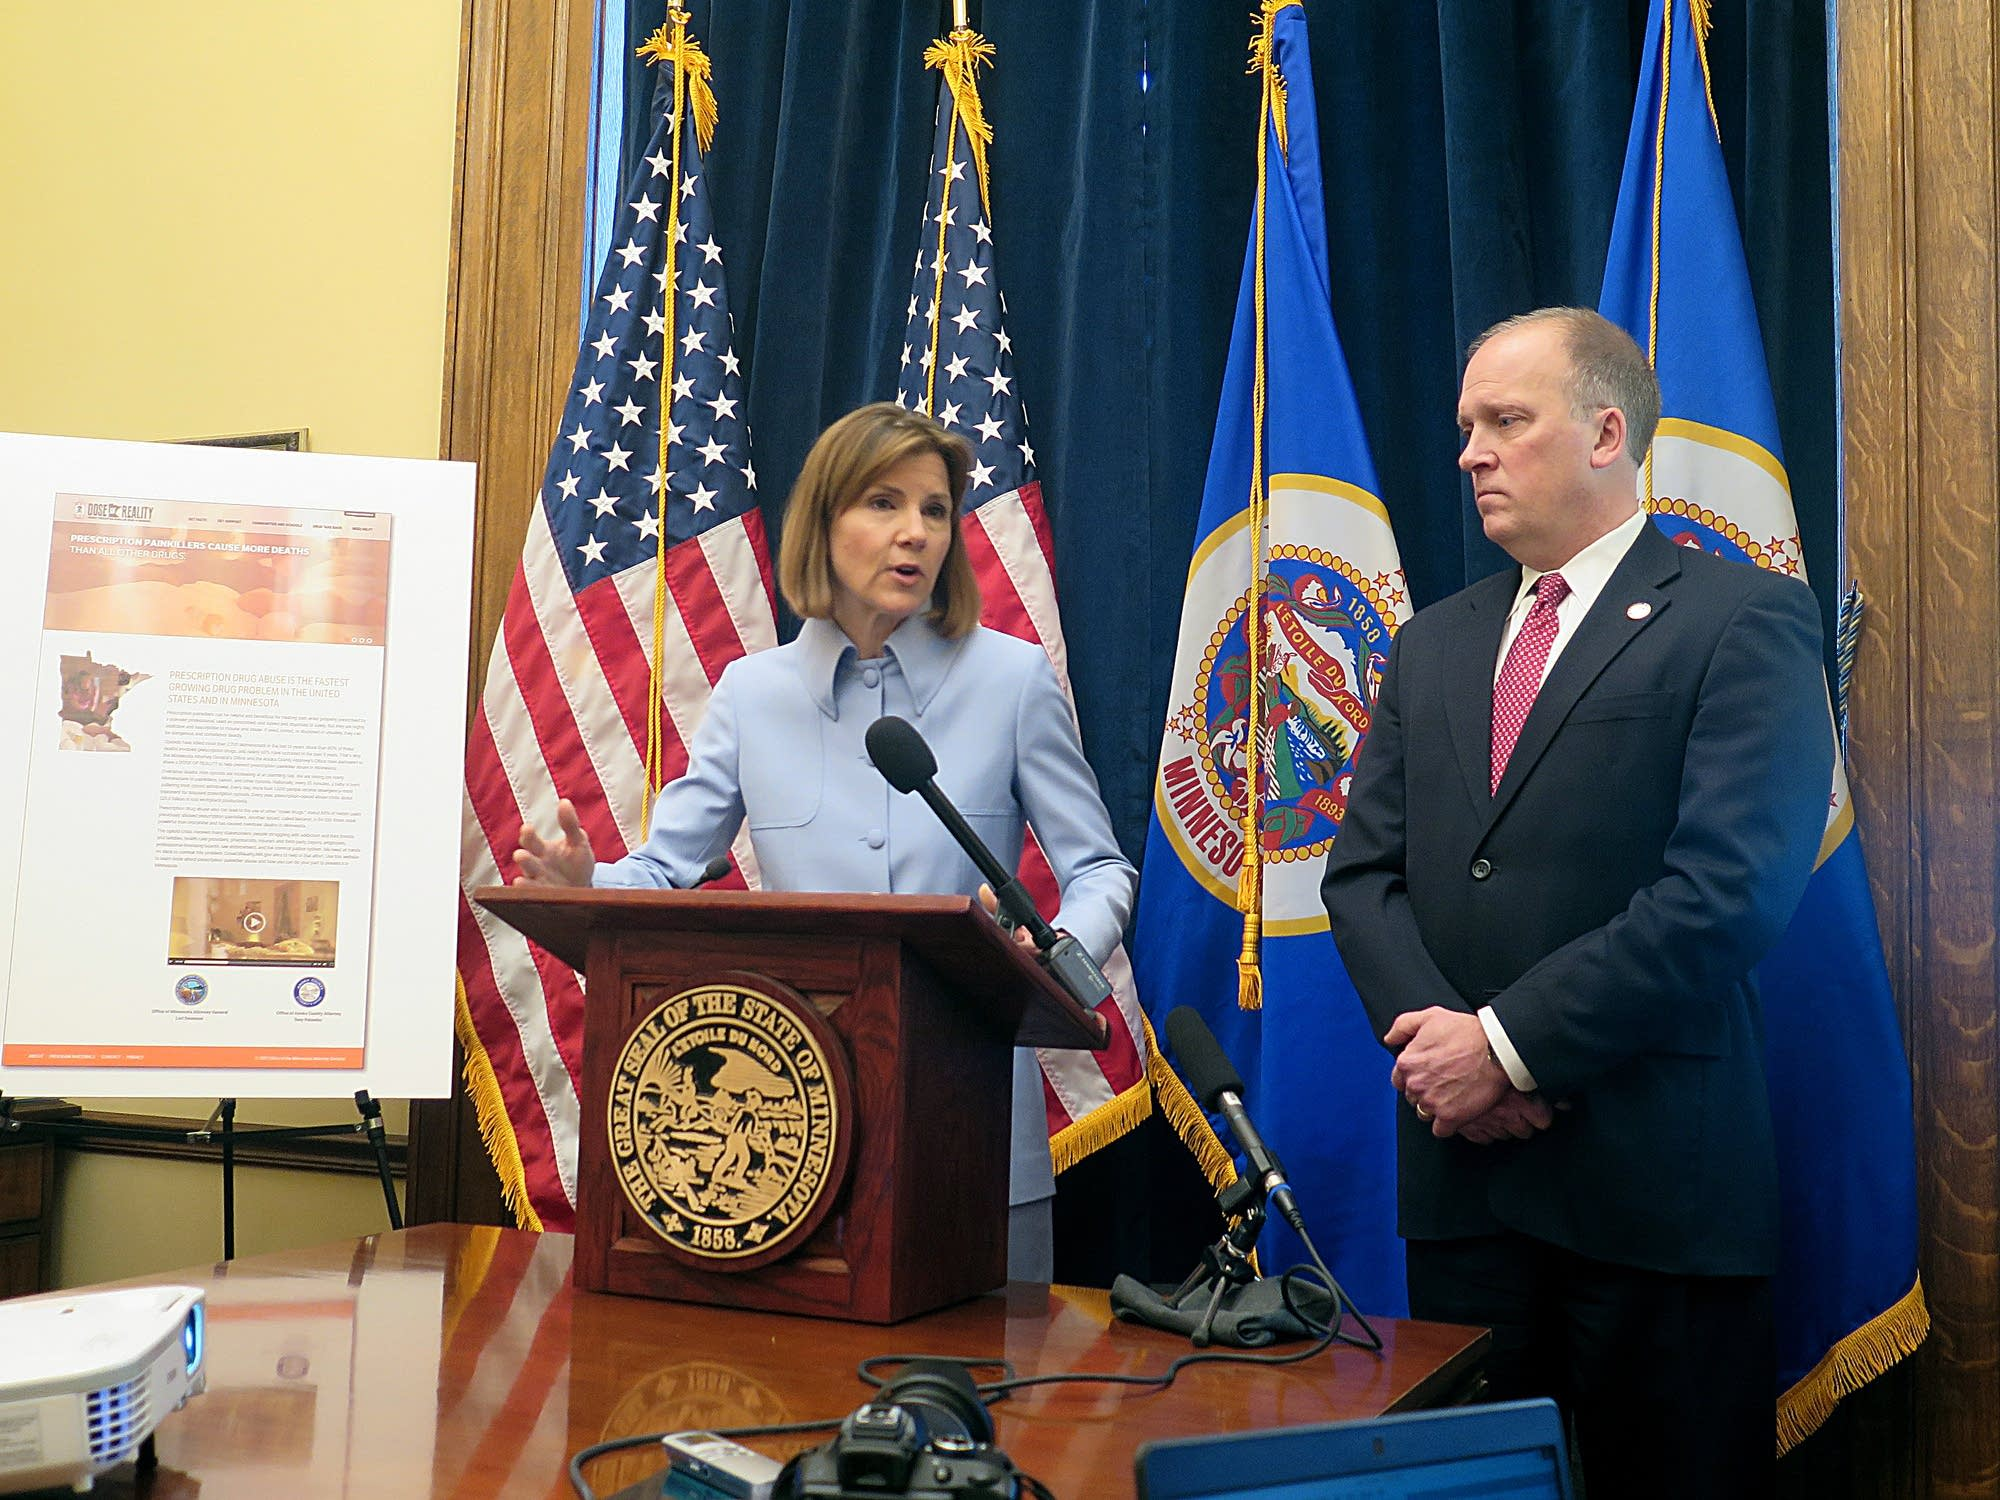 Minnesota AG Lori Swanson and Wisconsin AG Brad Schime